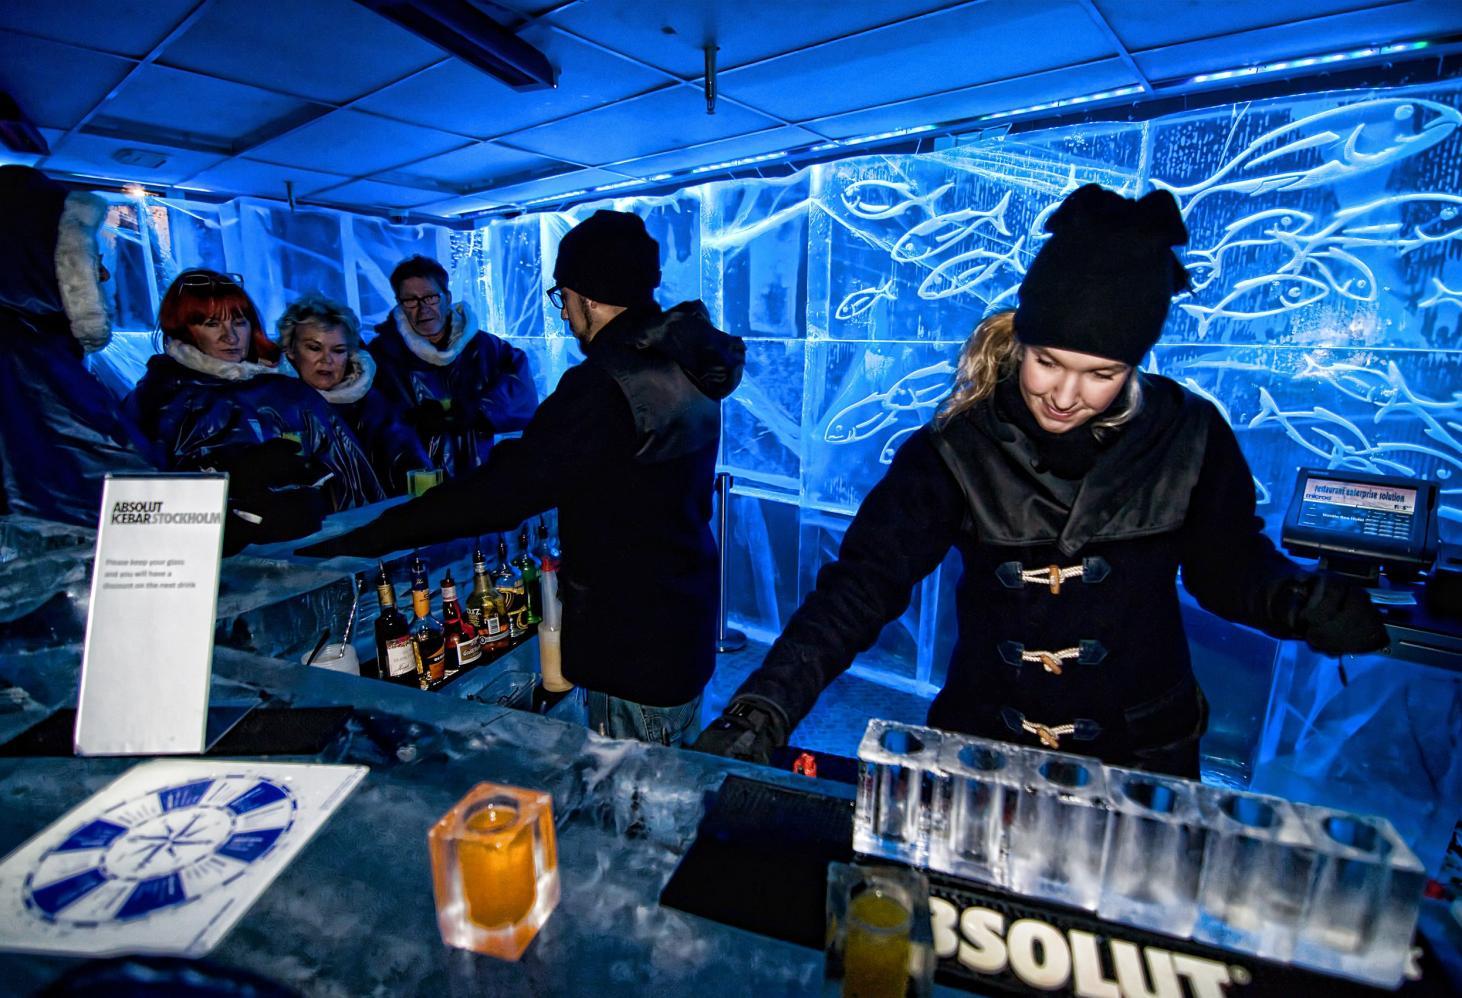 Ледяной бар (Absolut Icebar), Швеция